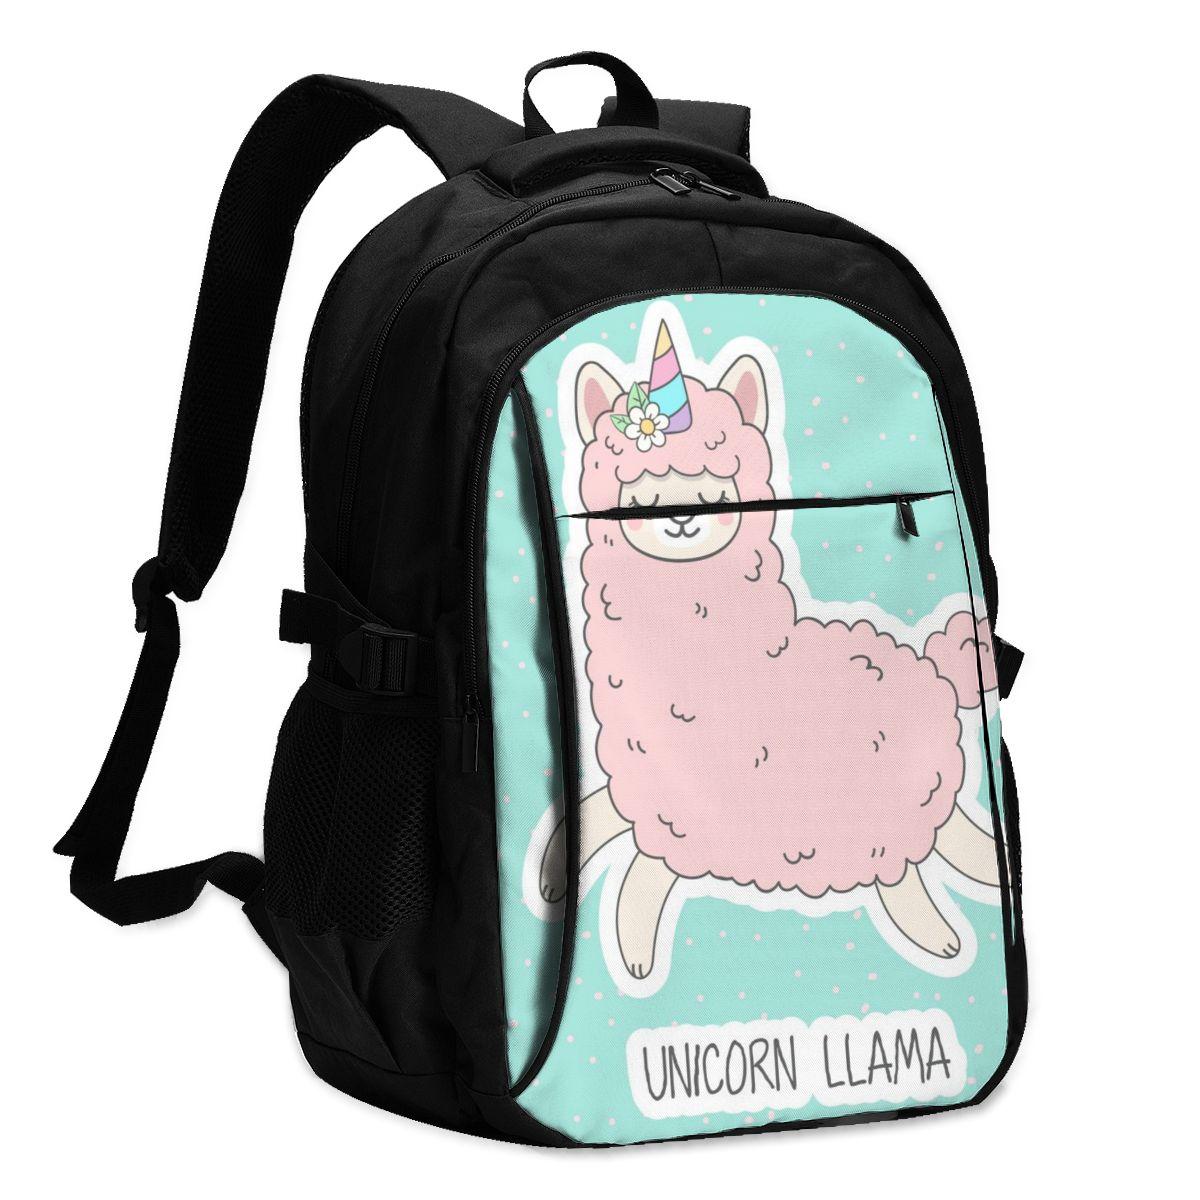 Mochila USB Charge para mujer, bonita mochila Rosa unicornio esponjoso Llama estudiante, mochila con letras impresas, mochila escolar para chicas adolescentes